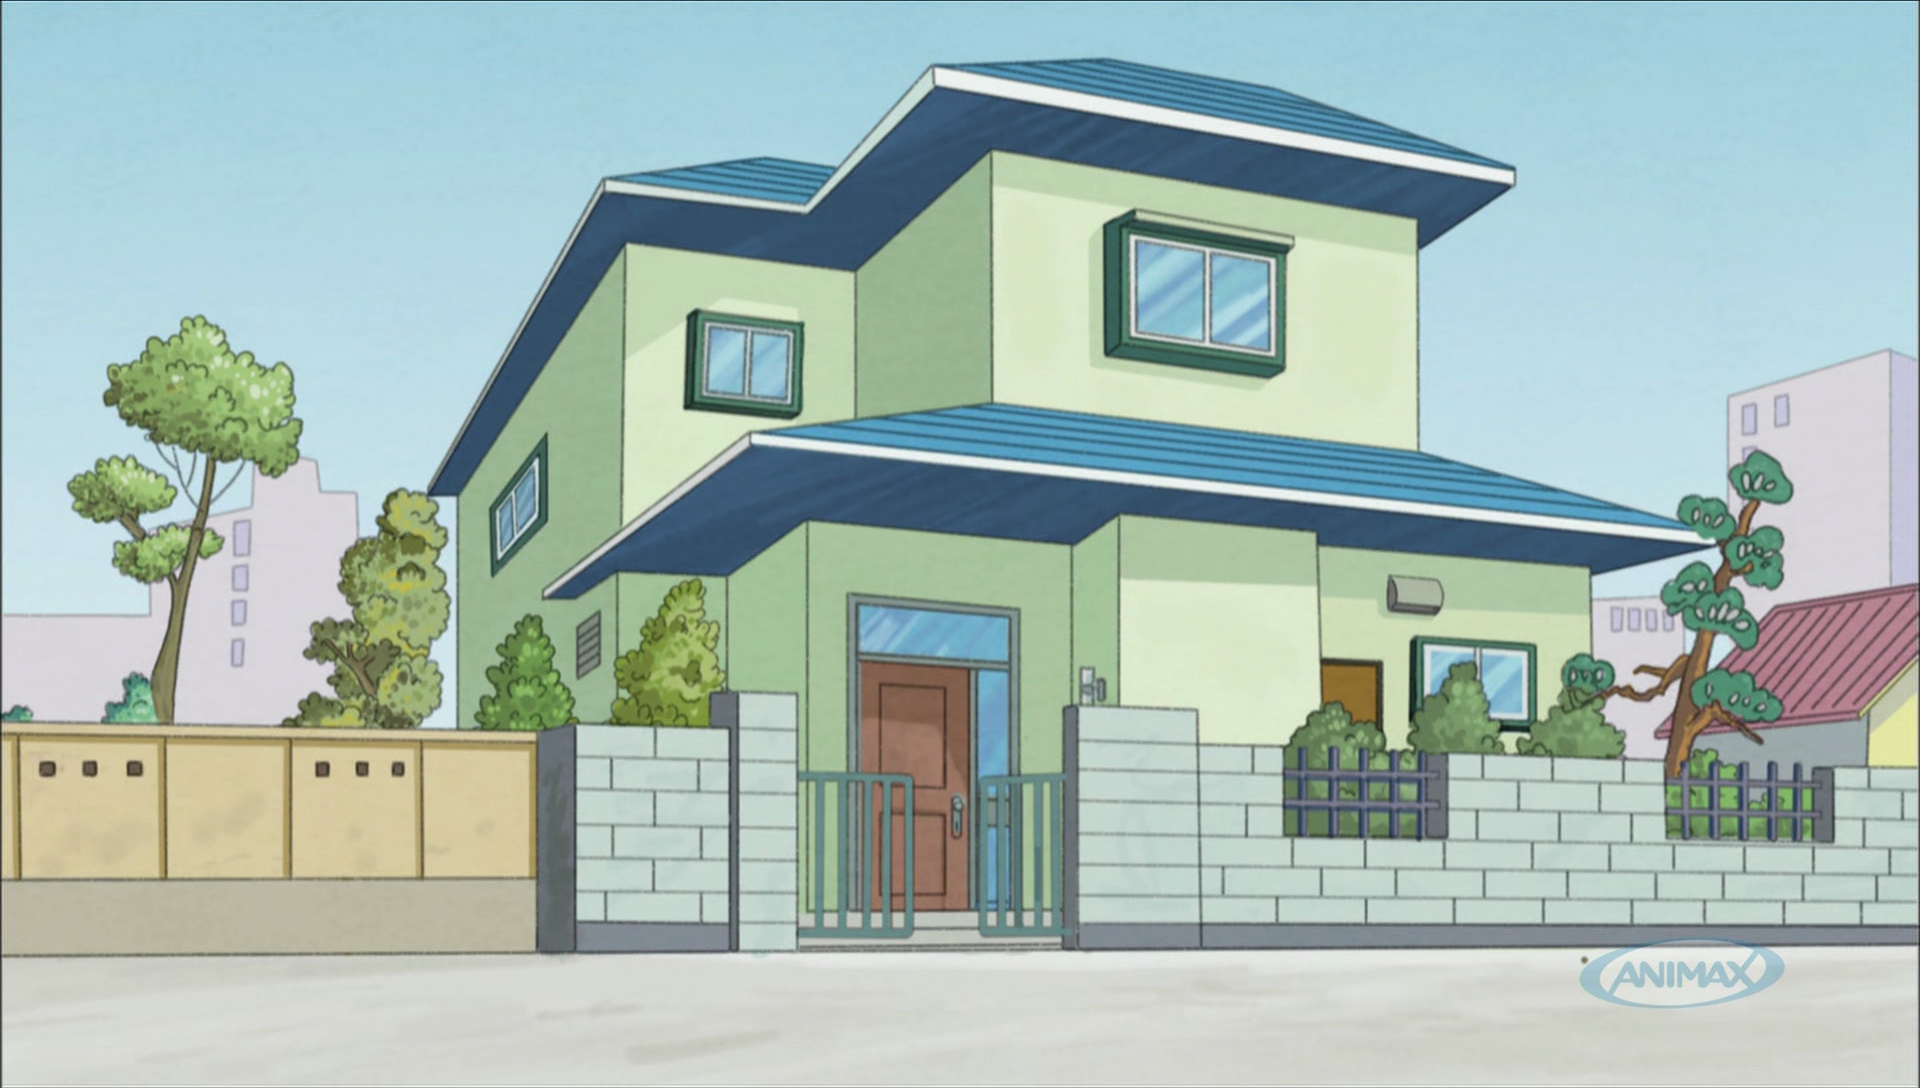 mitsuba family s house ninja hattori wiki fandom powered by wikia rh ninjahattori fandom com